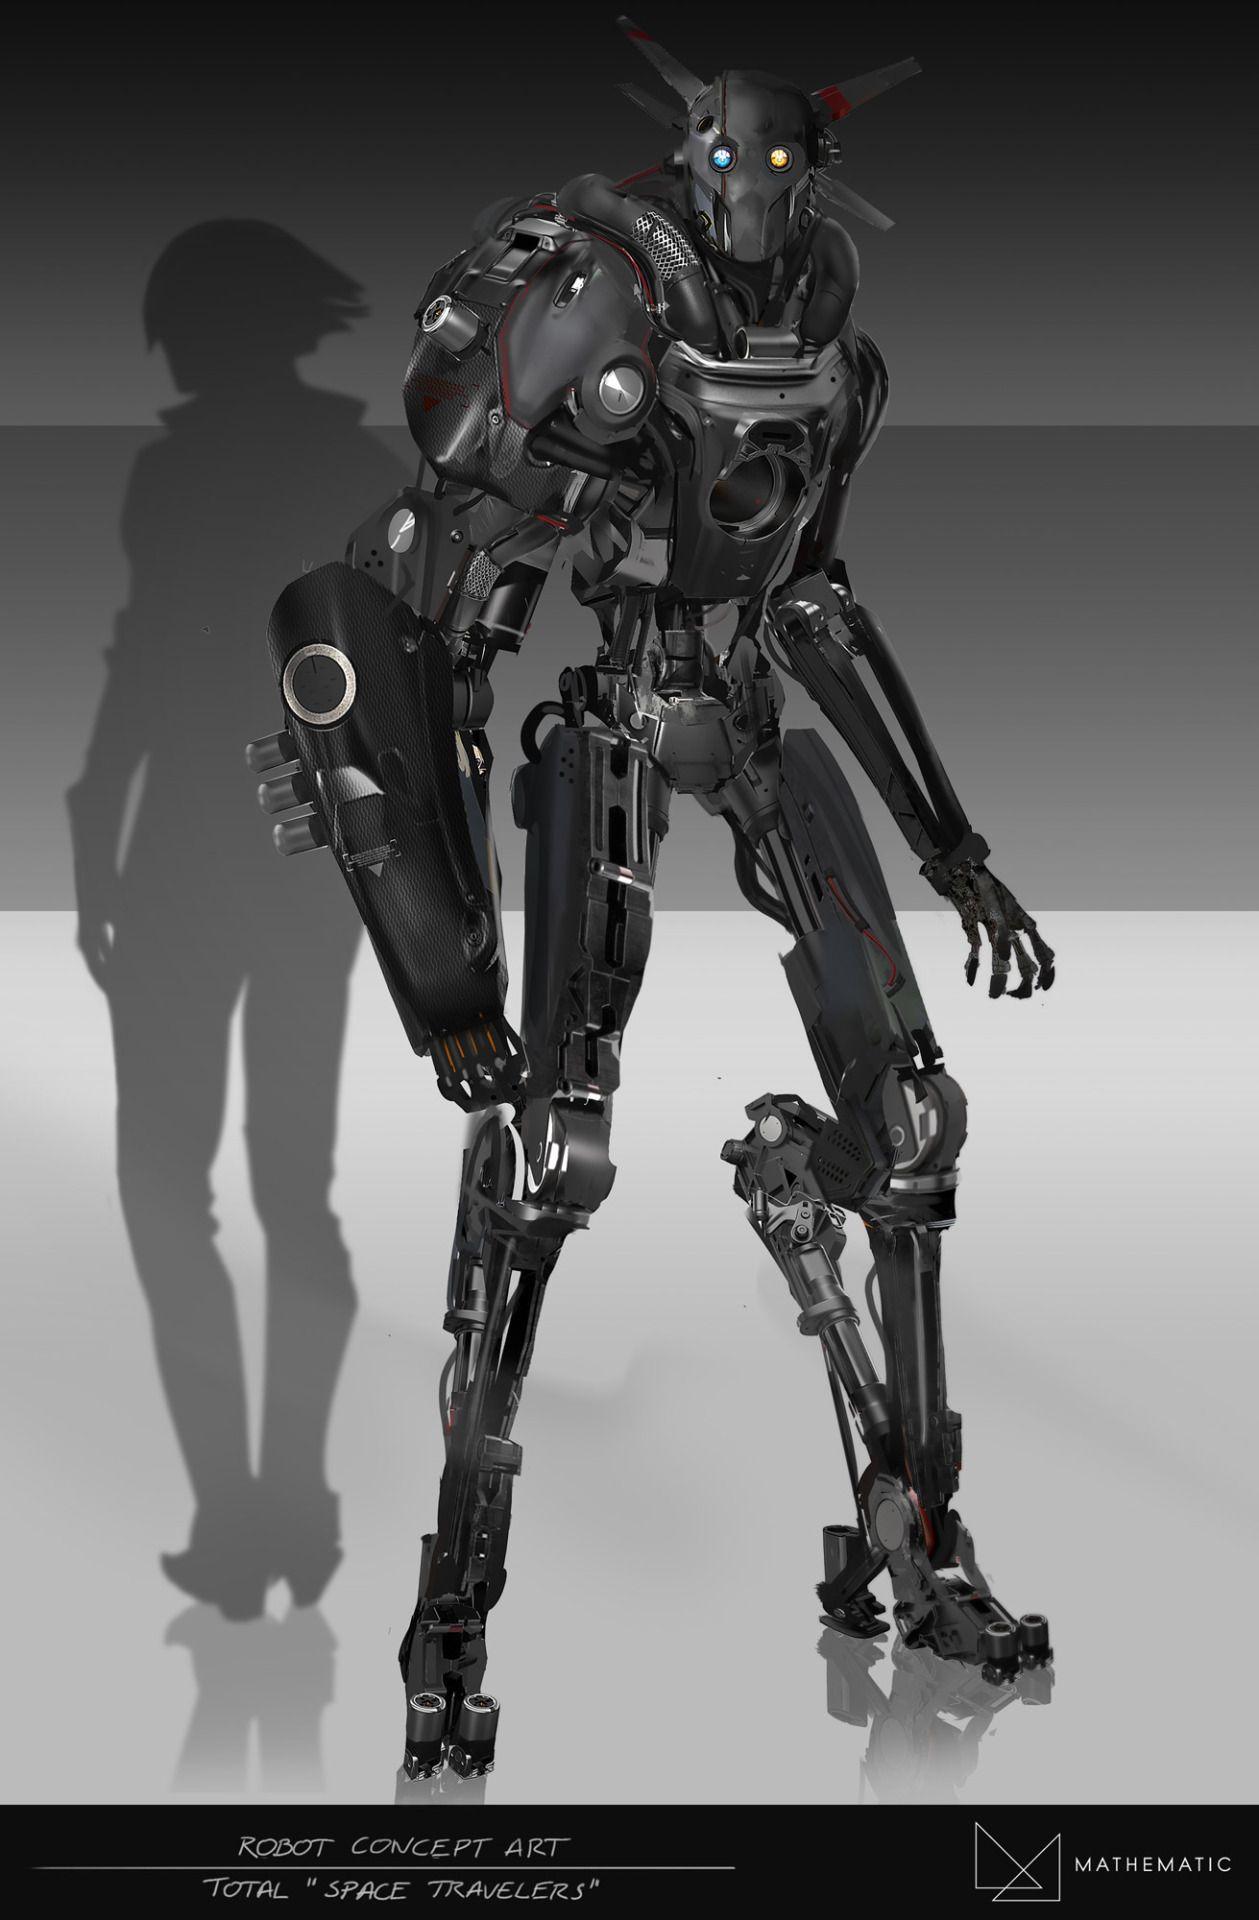 Robot Concept Art Total Advertising